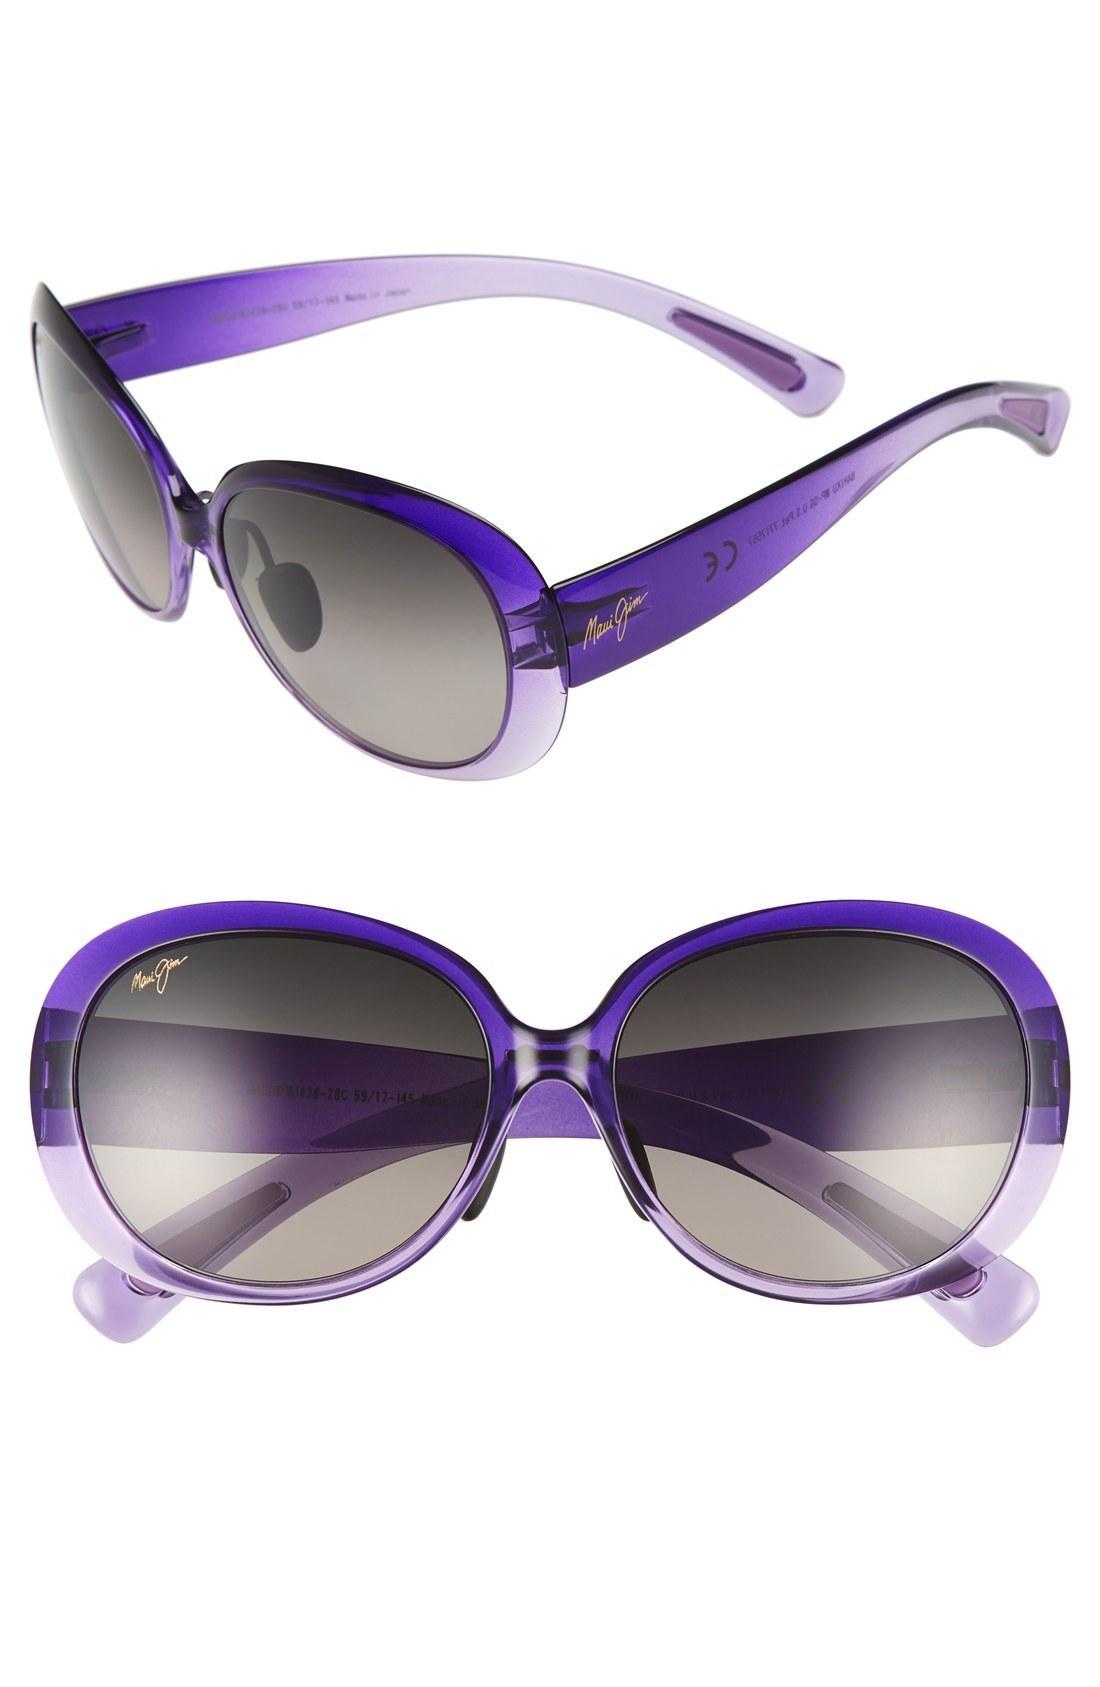 c8de2b5a6e Maui Jim Nahiku 59Mm Polarizedplus2 Sunglasses - Purple Fade  Neutral Grey